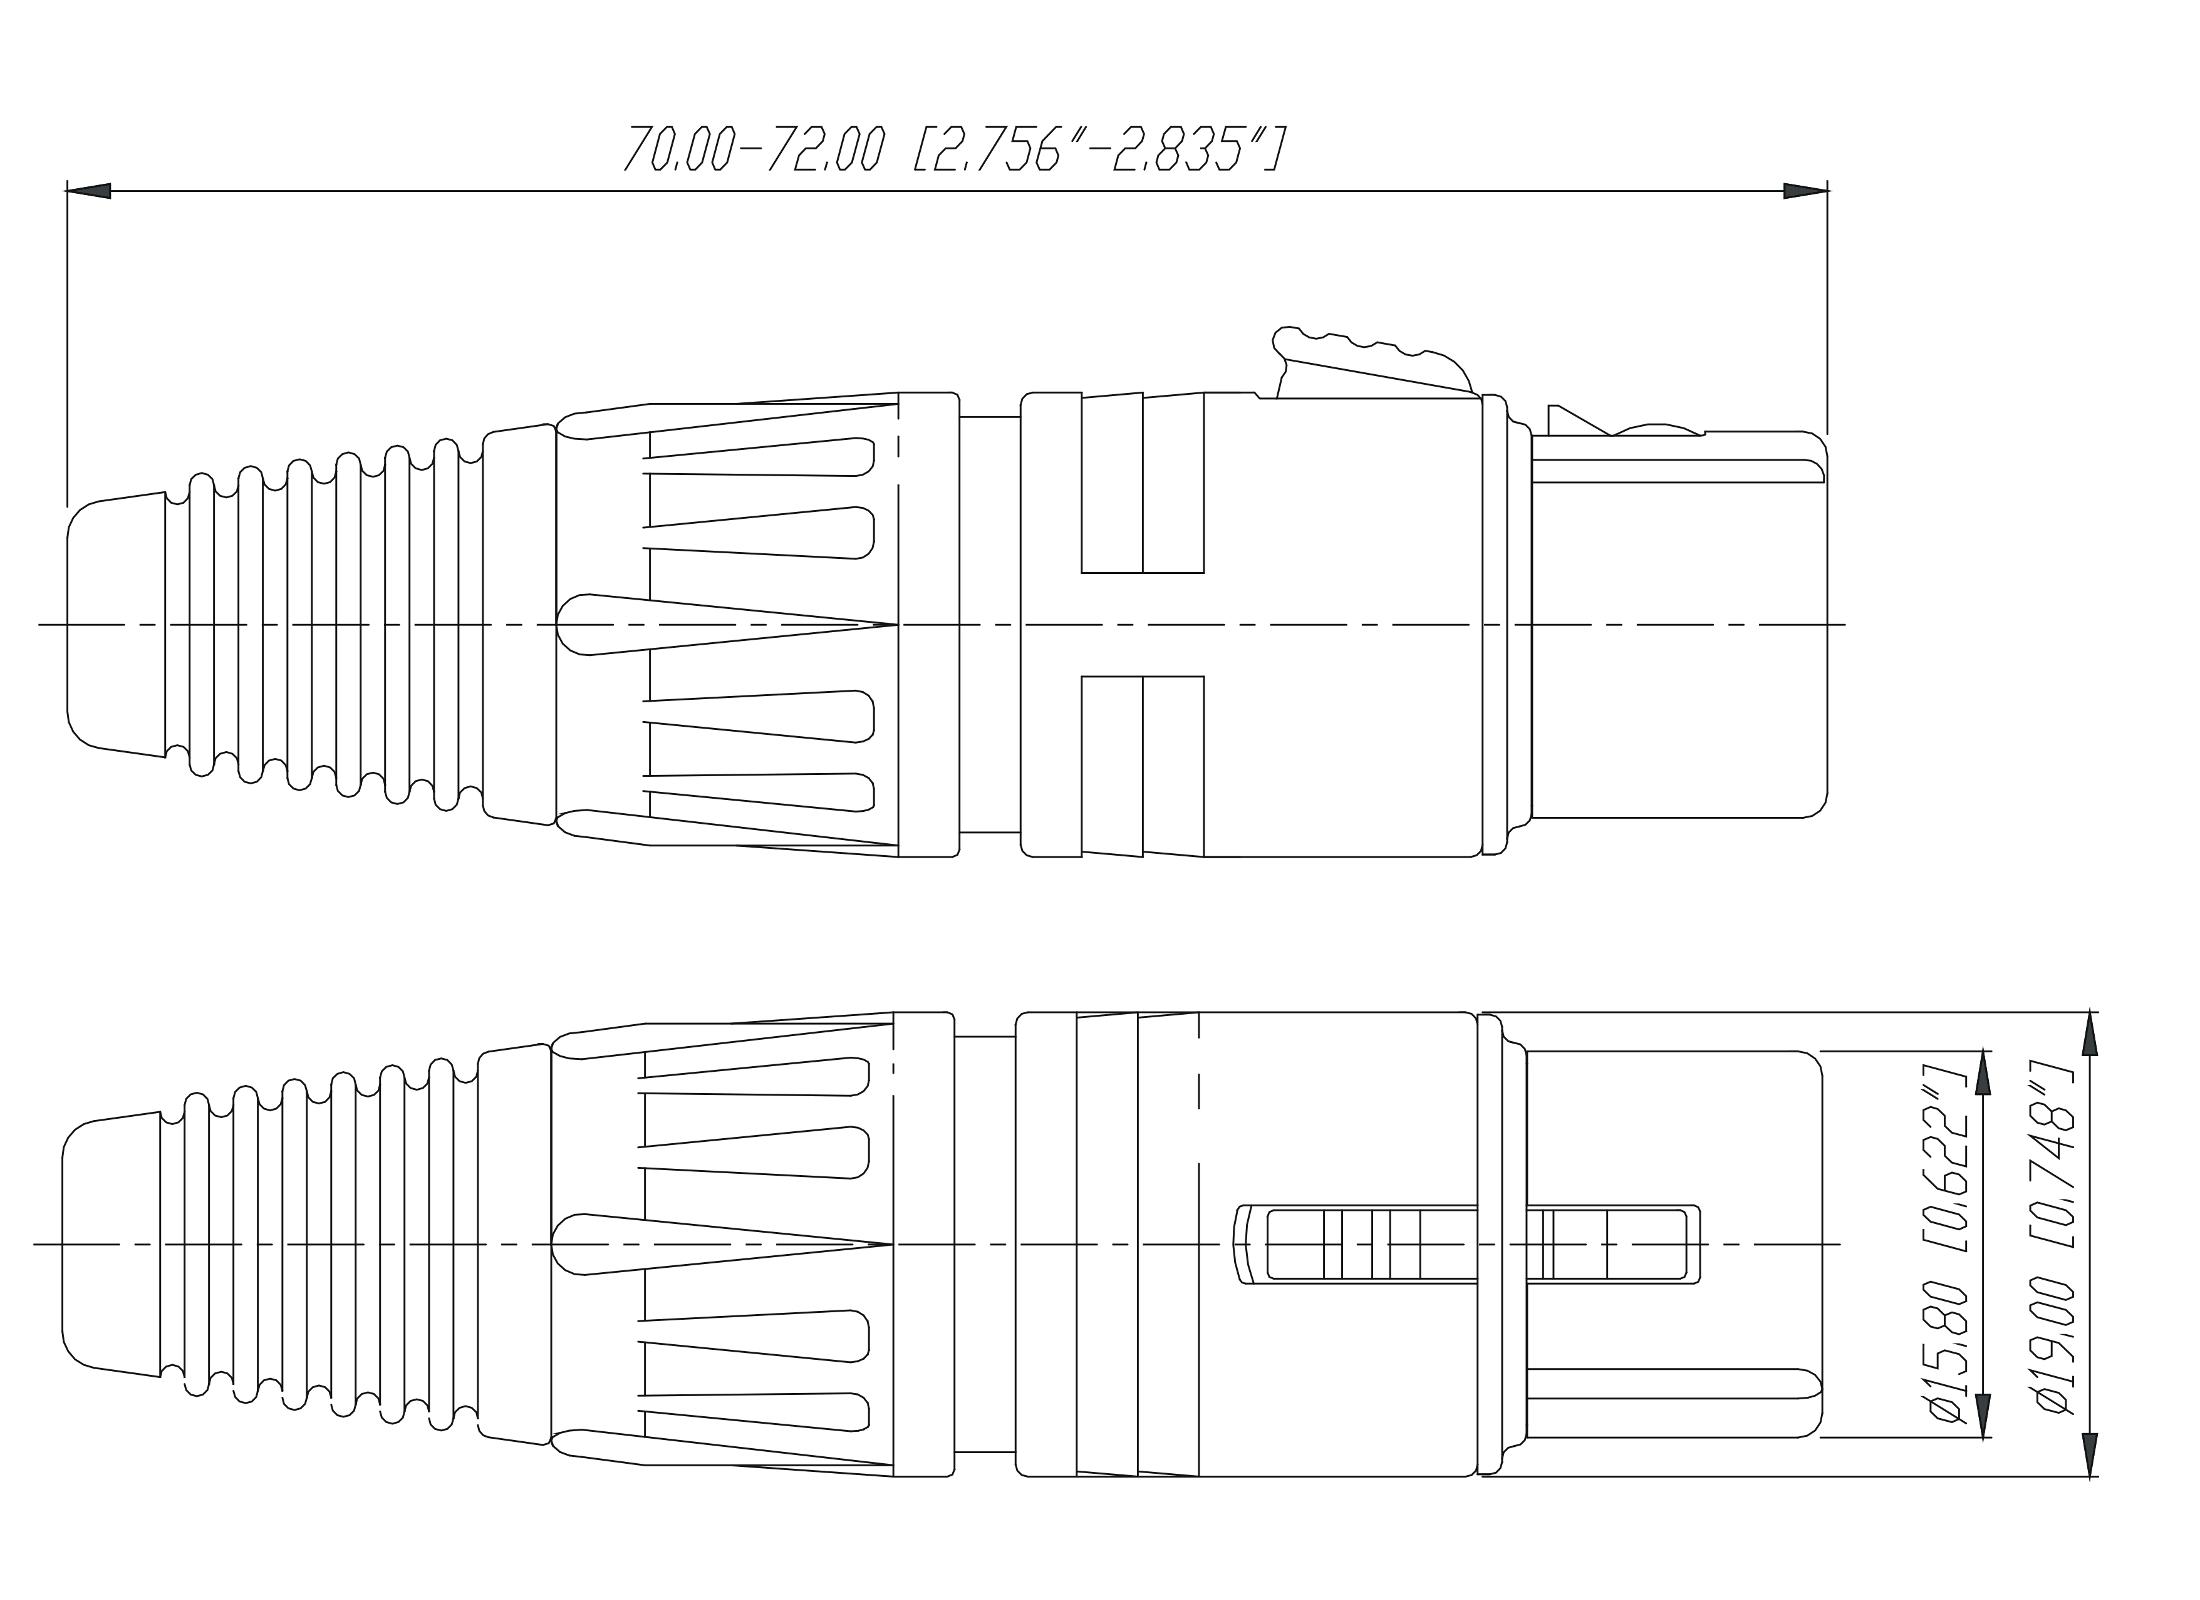 Nc3mx Wiring Diagram : Nc mx wiring diagram choice image sample